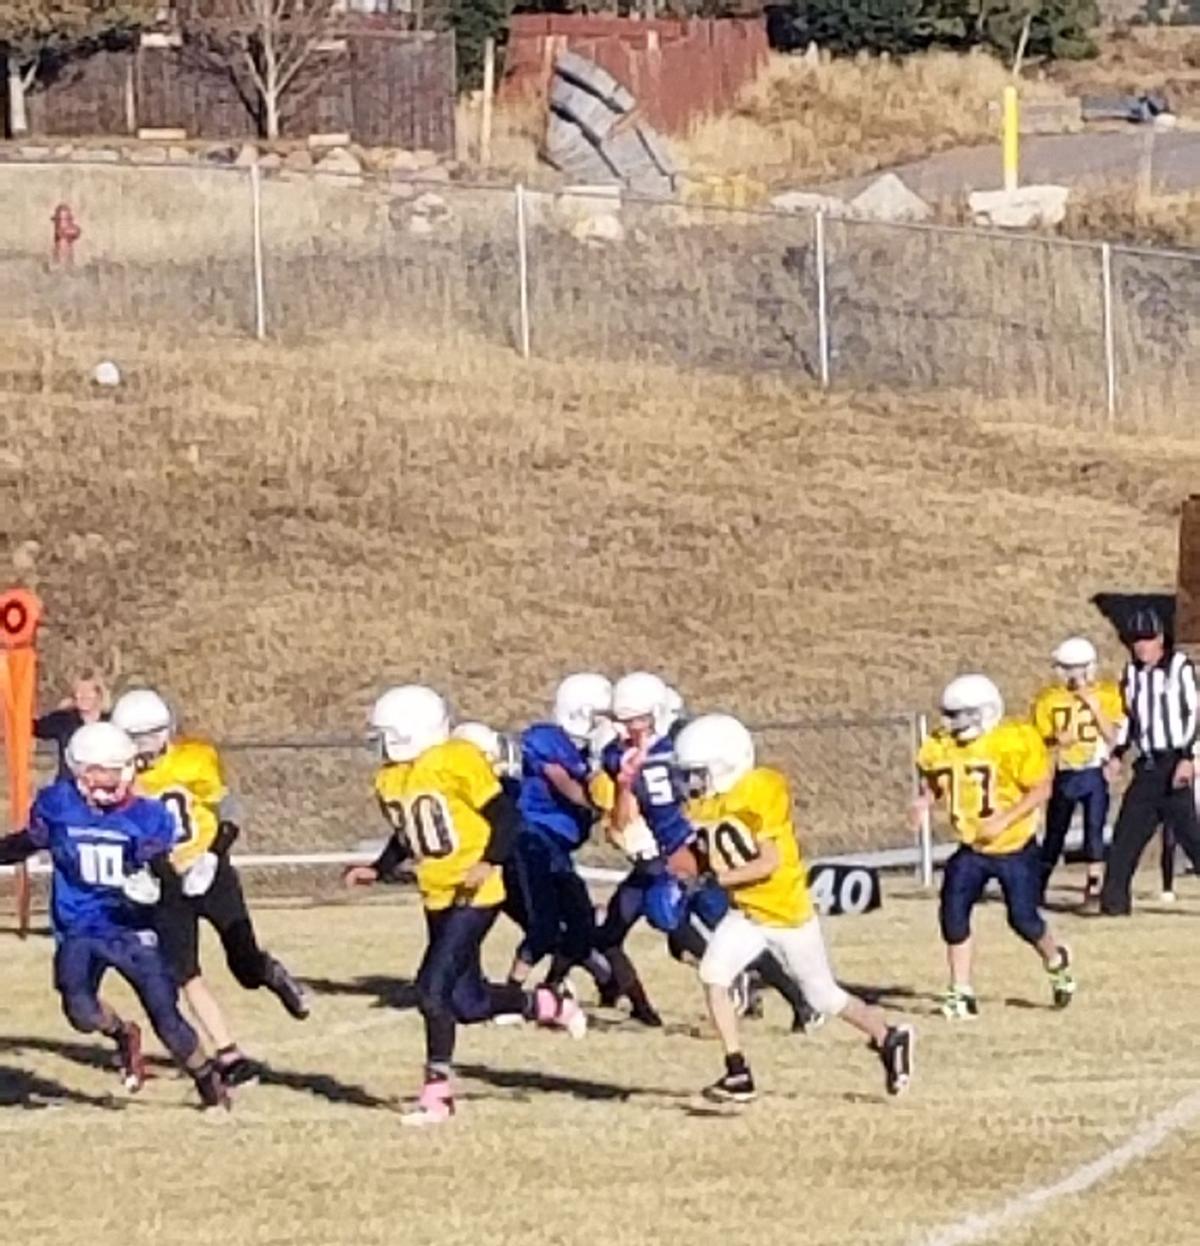 CCV Junior High football team finishes season with win, loss